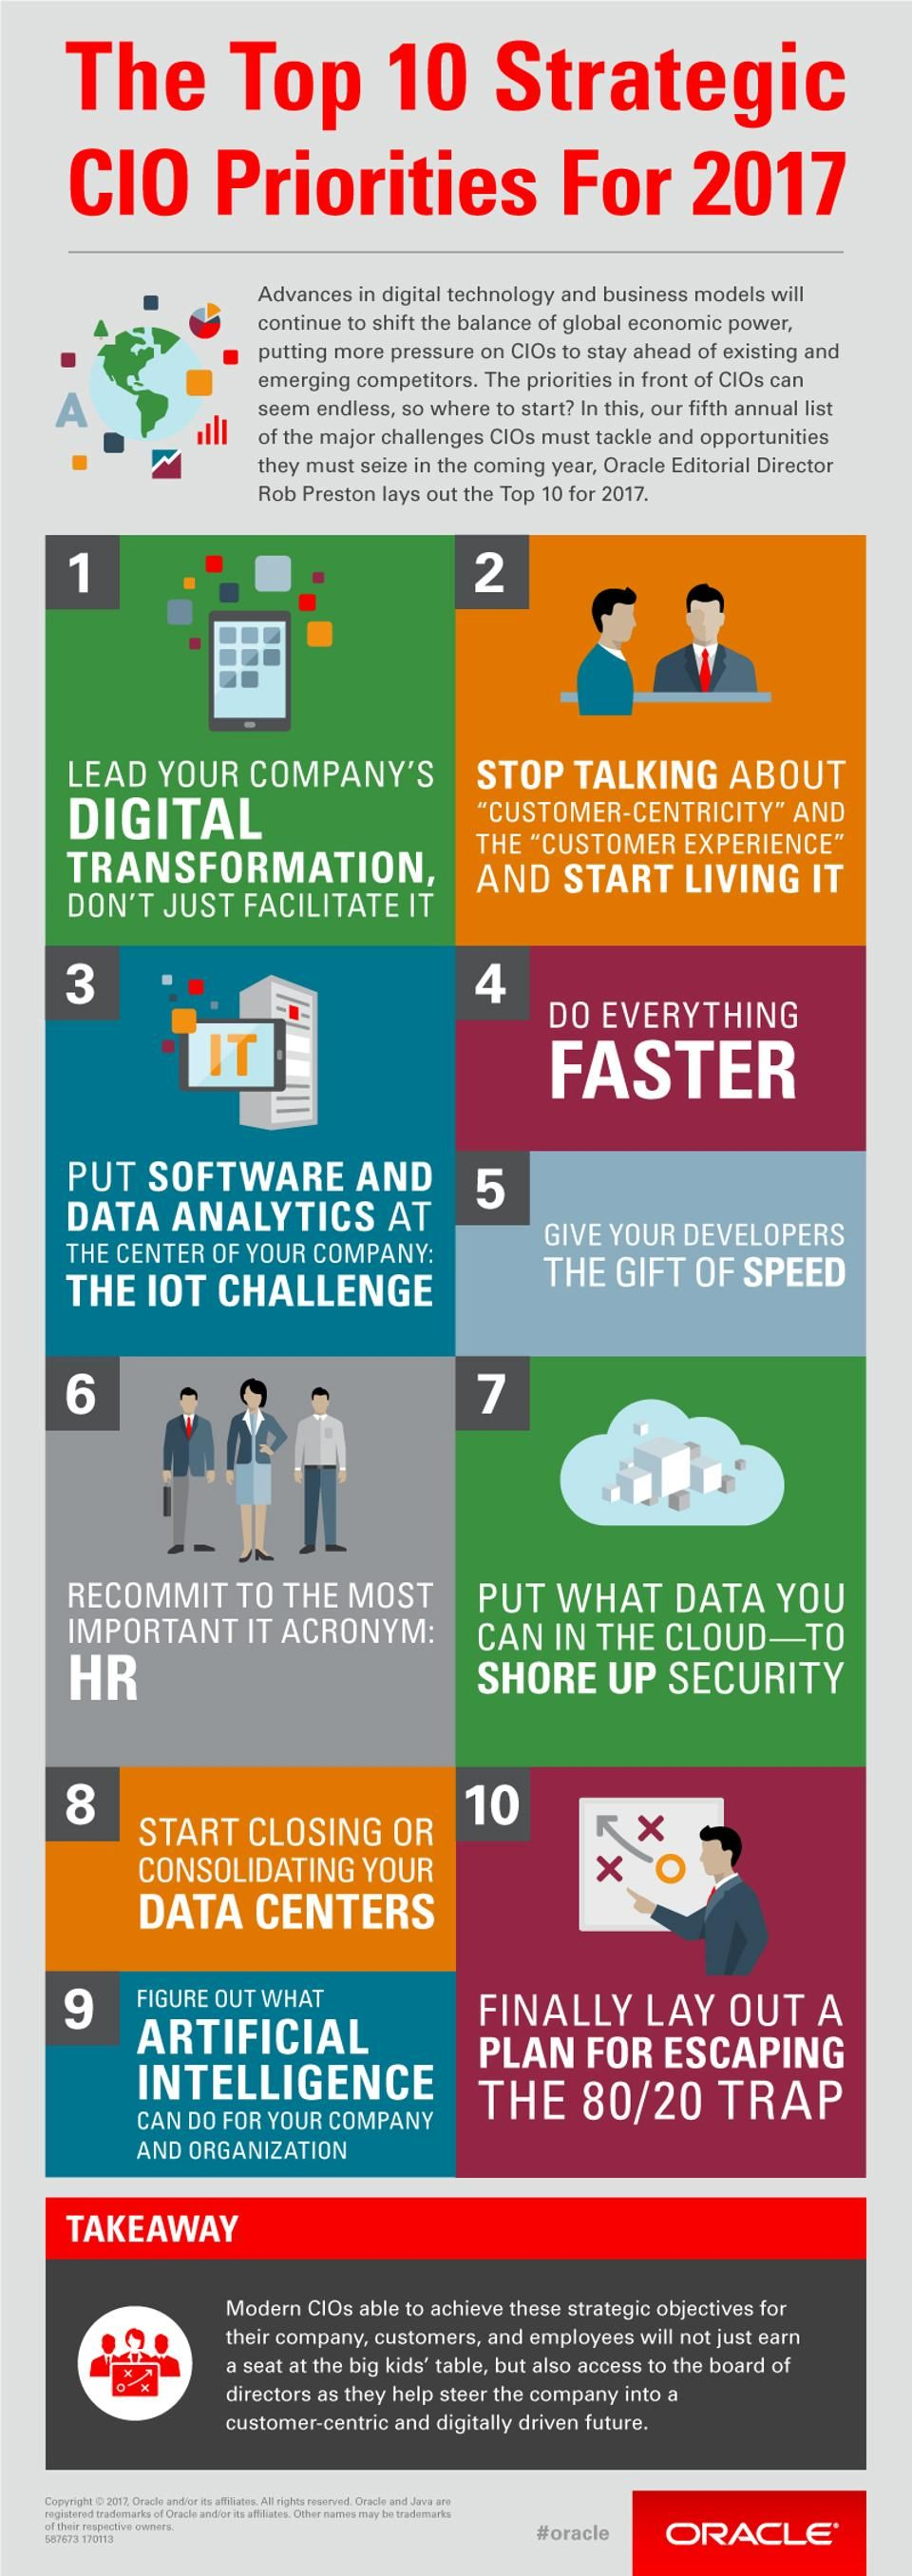 Mahor Technology Management: Top 10 Strategic CIO Priorities For 2017